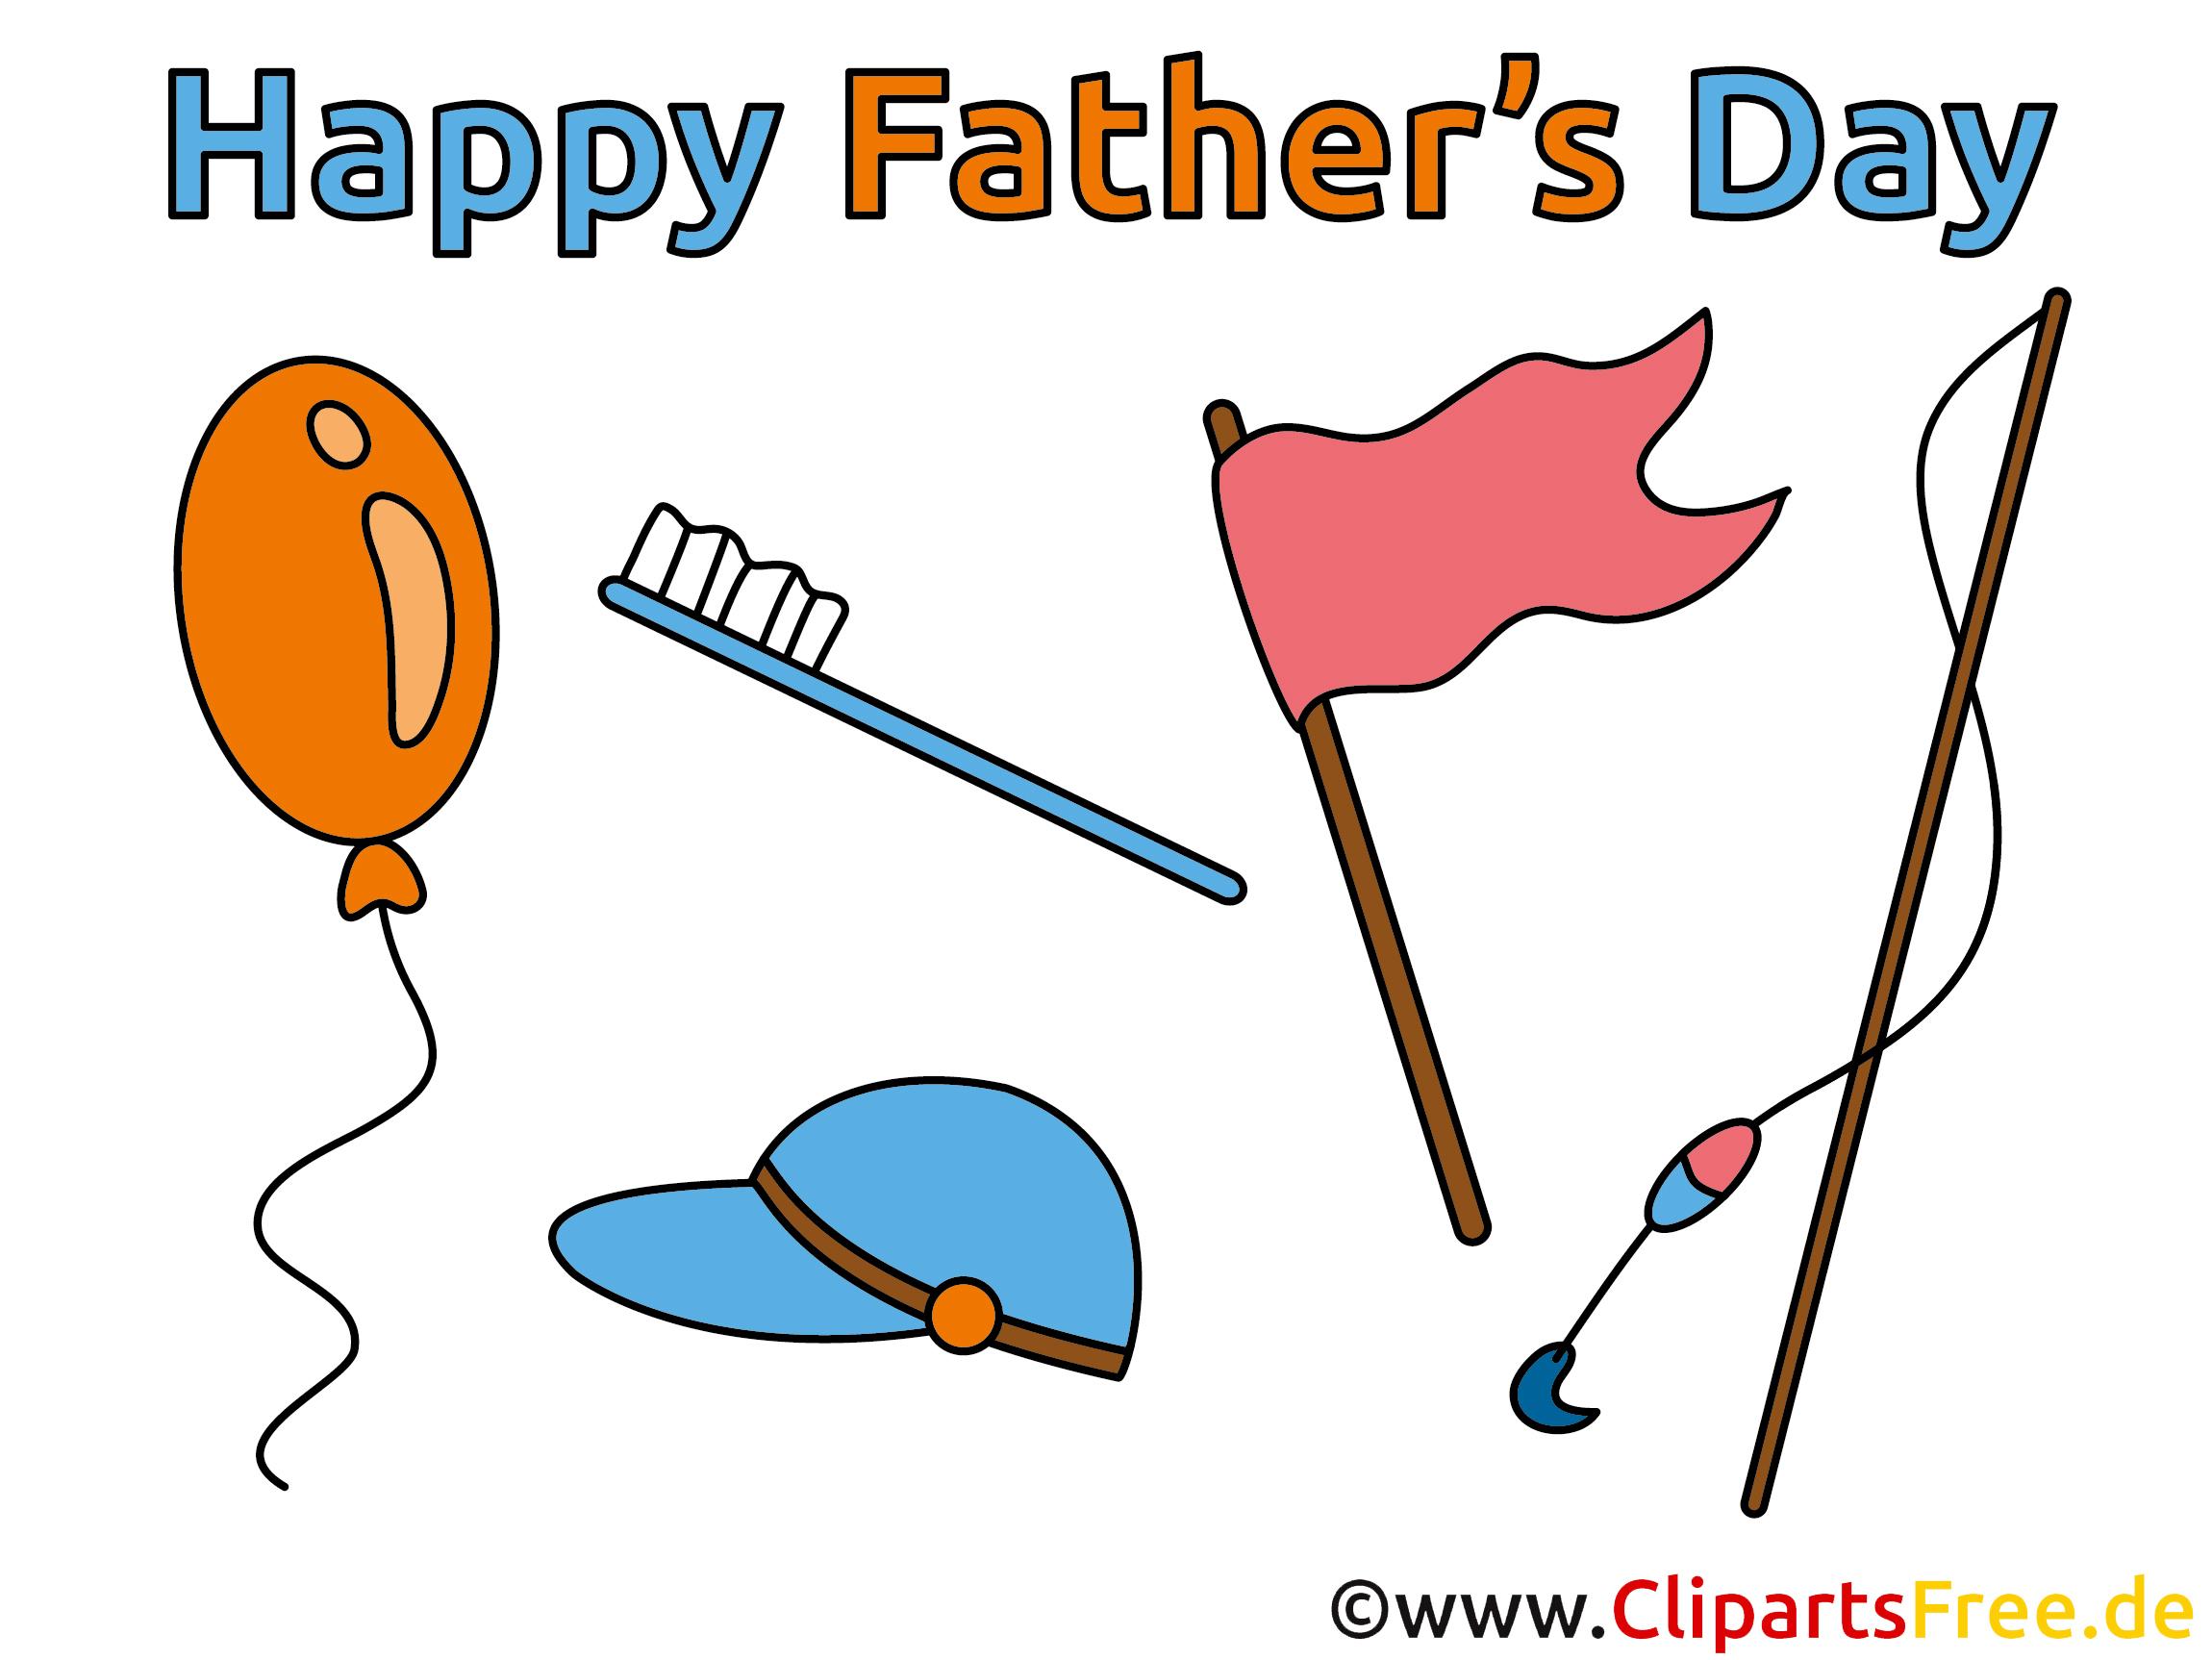 Cliparts zum Vatertag